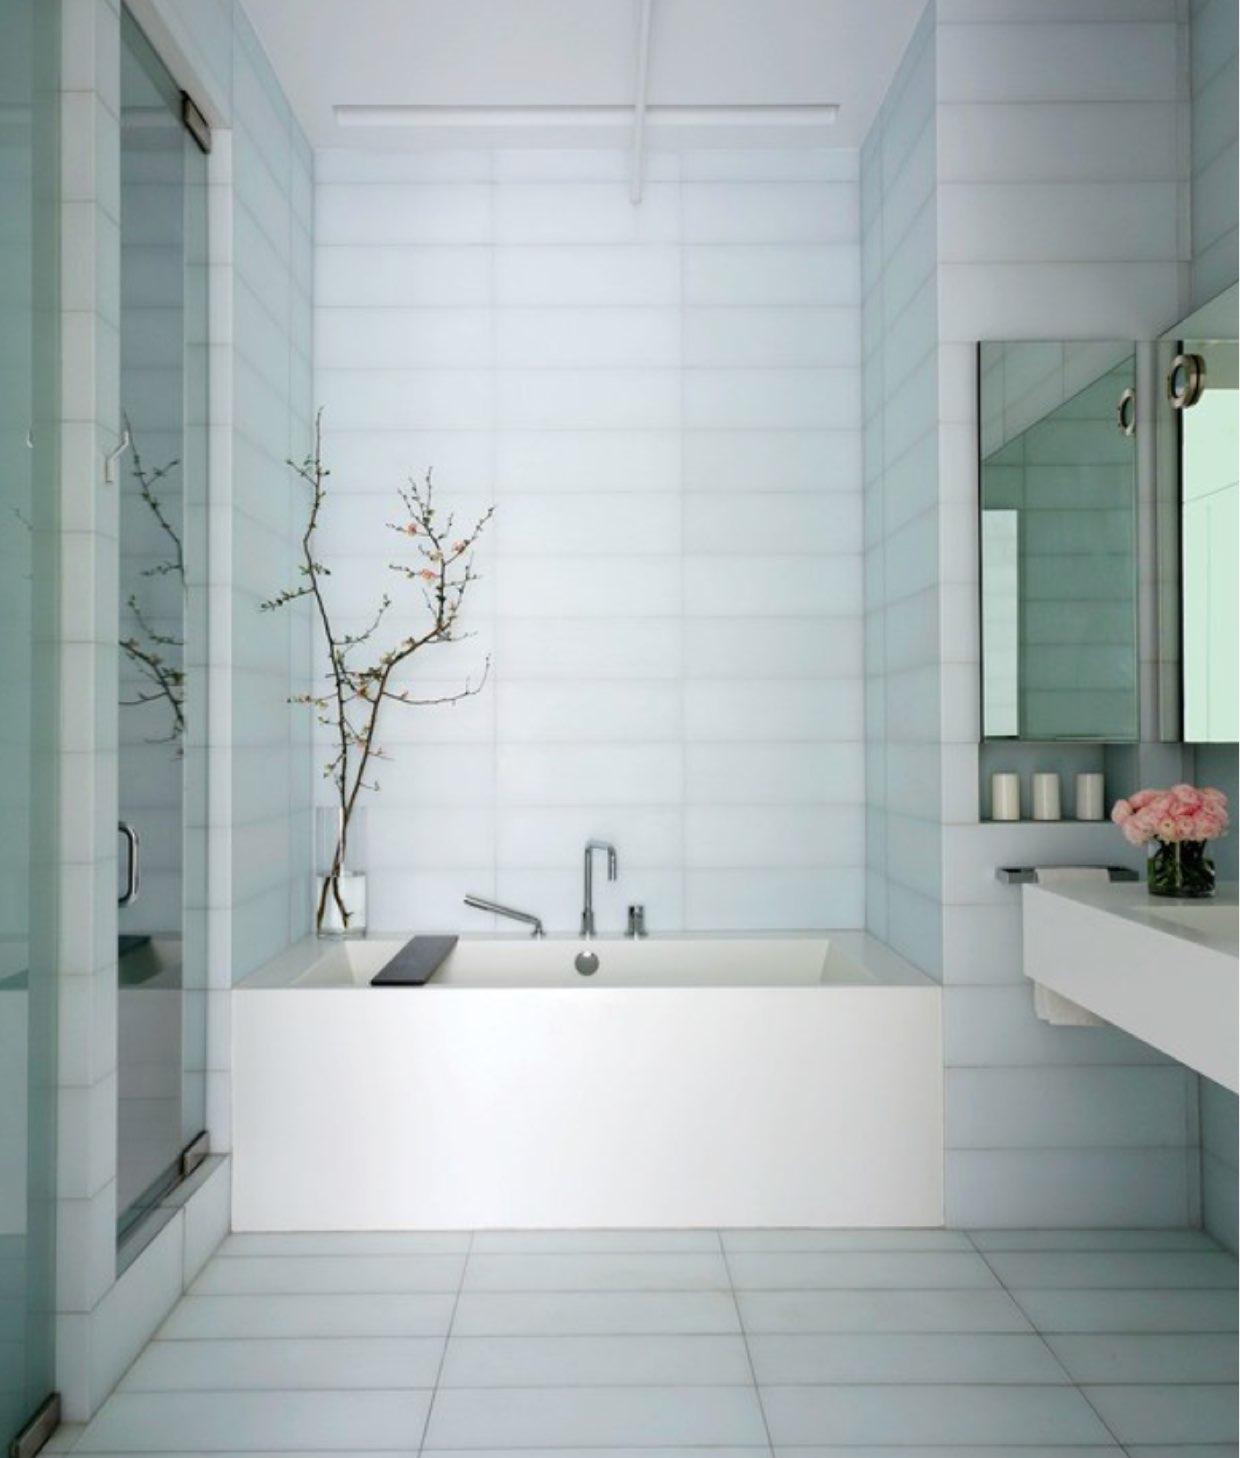 13 Gorgeous Minimalist Bathrooms Photos | Architectural Digest.jpg